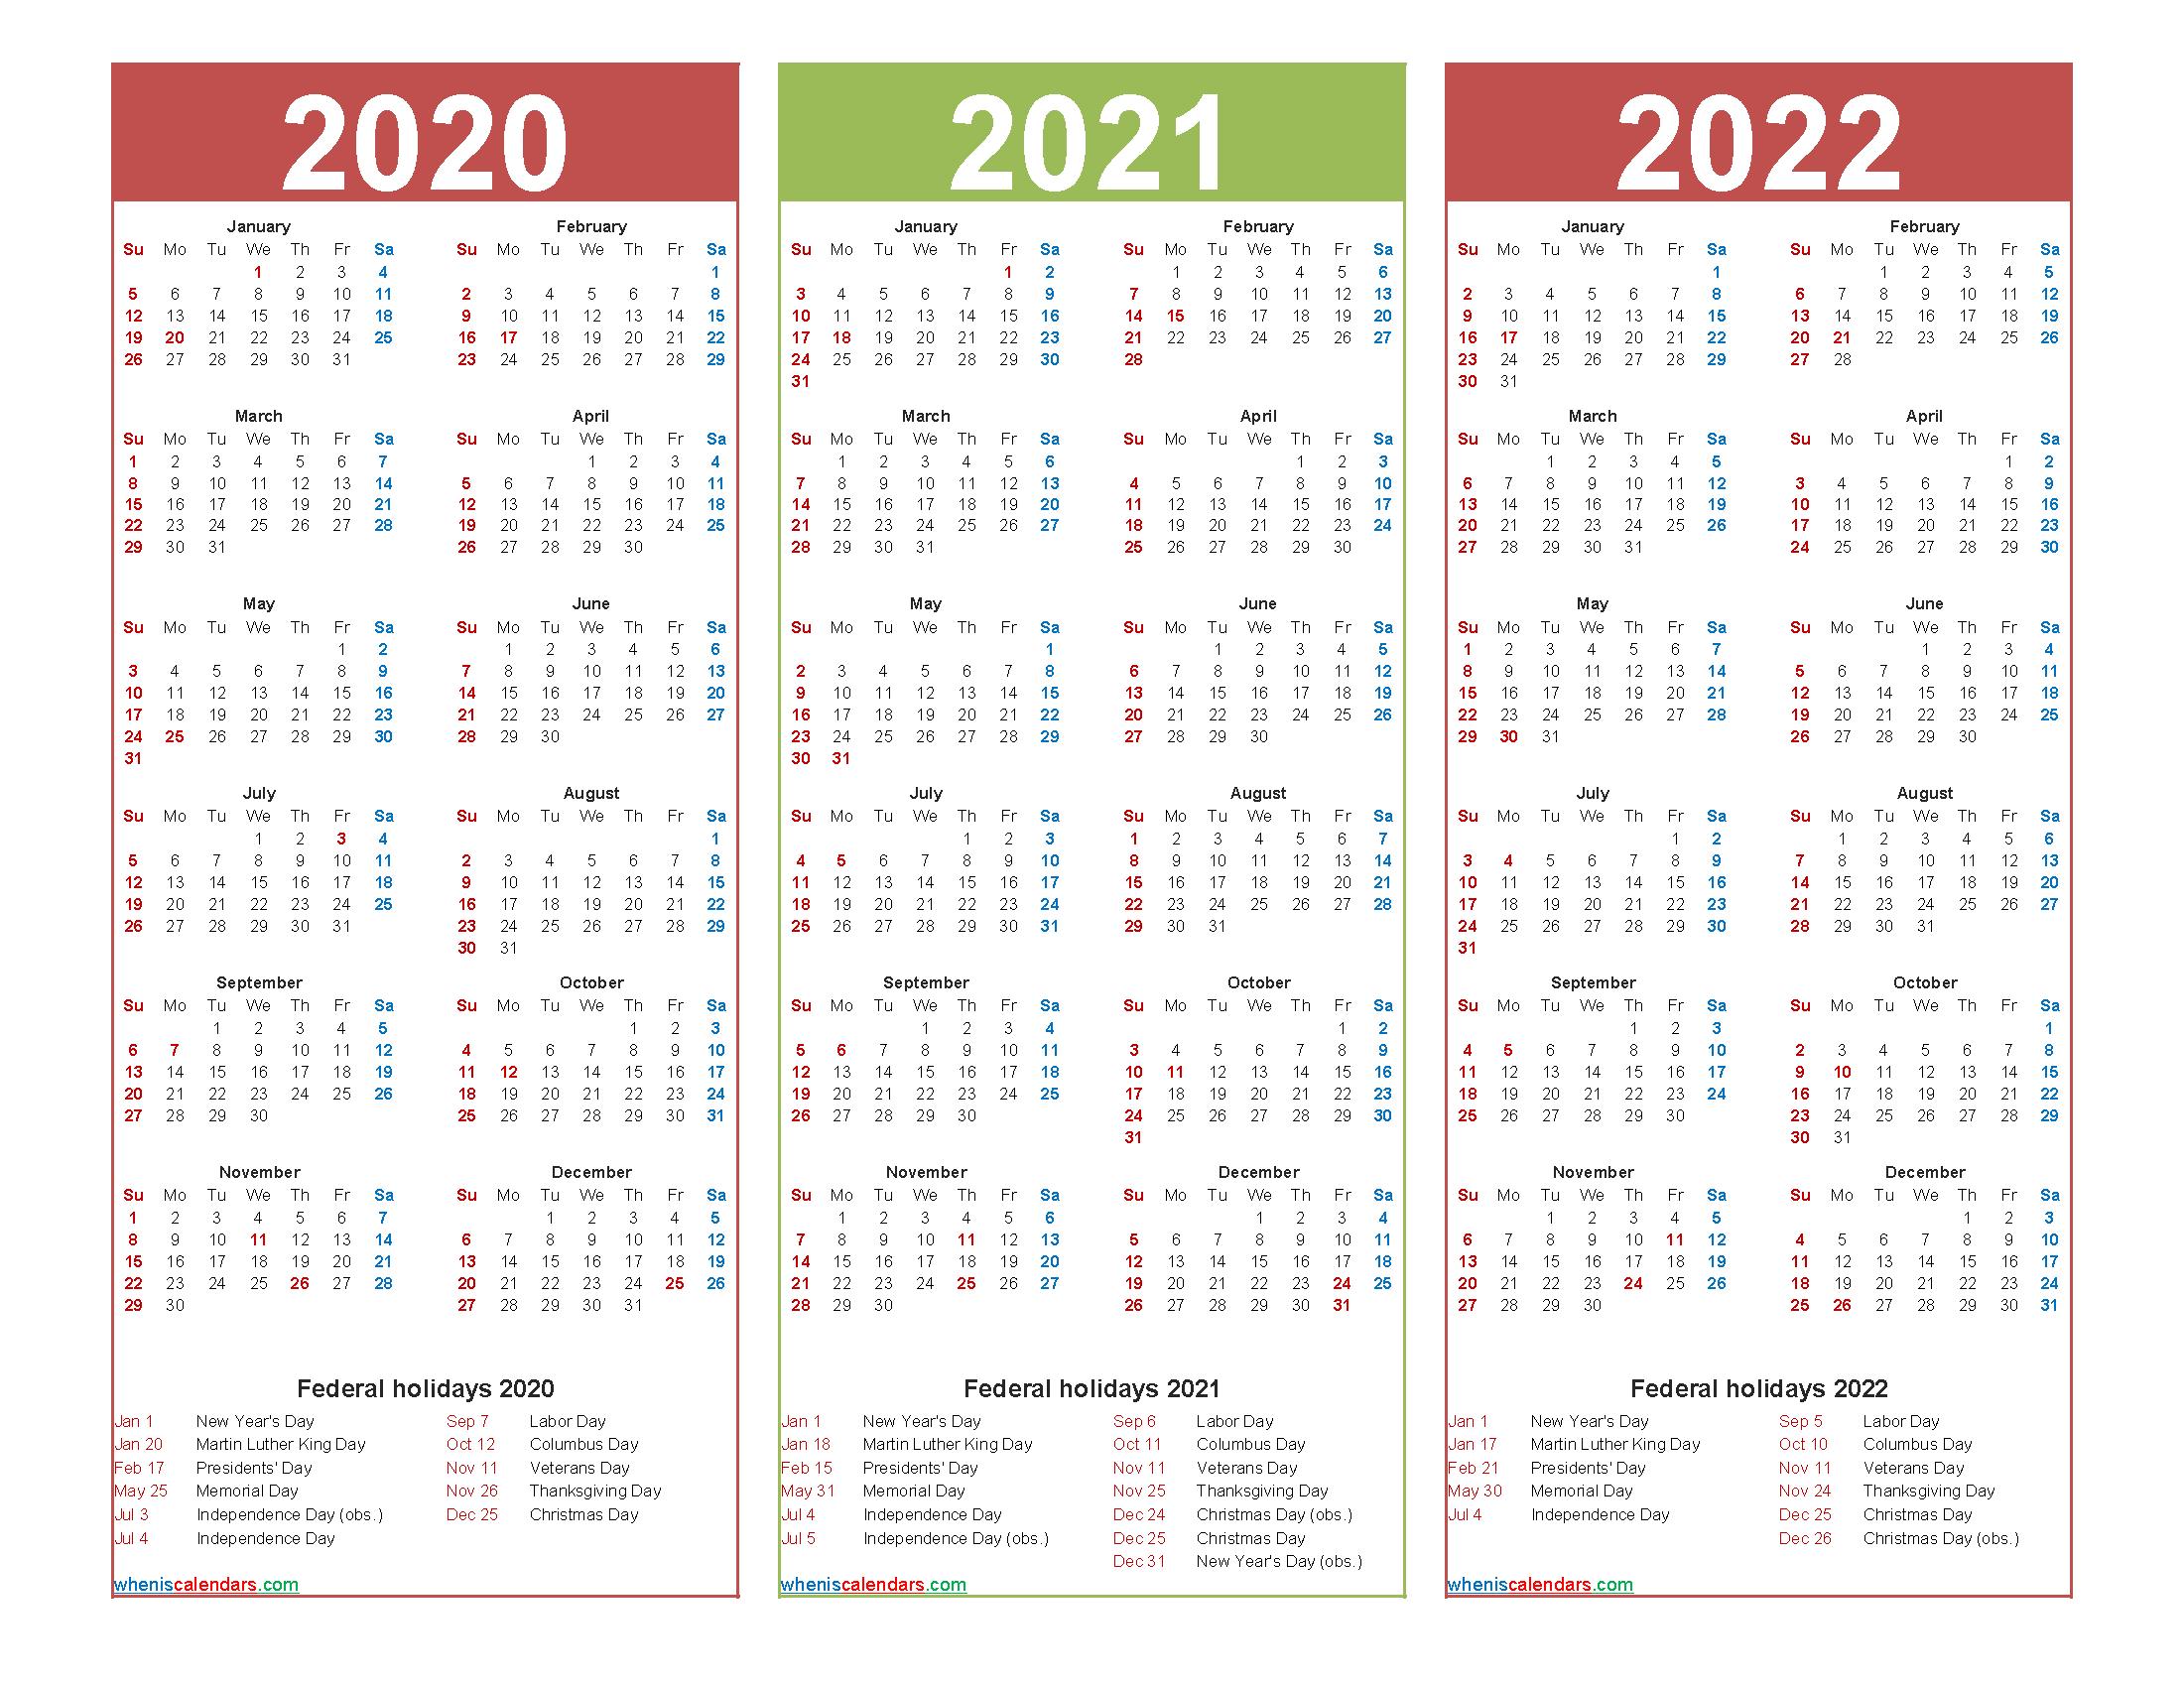 Three Year 2020 To 2022 Calendar Printable Word, Pdf-2021 2022 2023 Printable Calendar